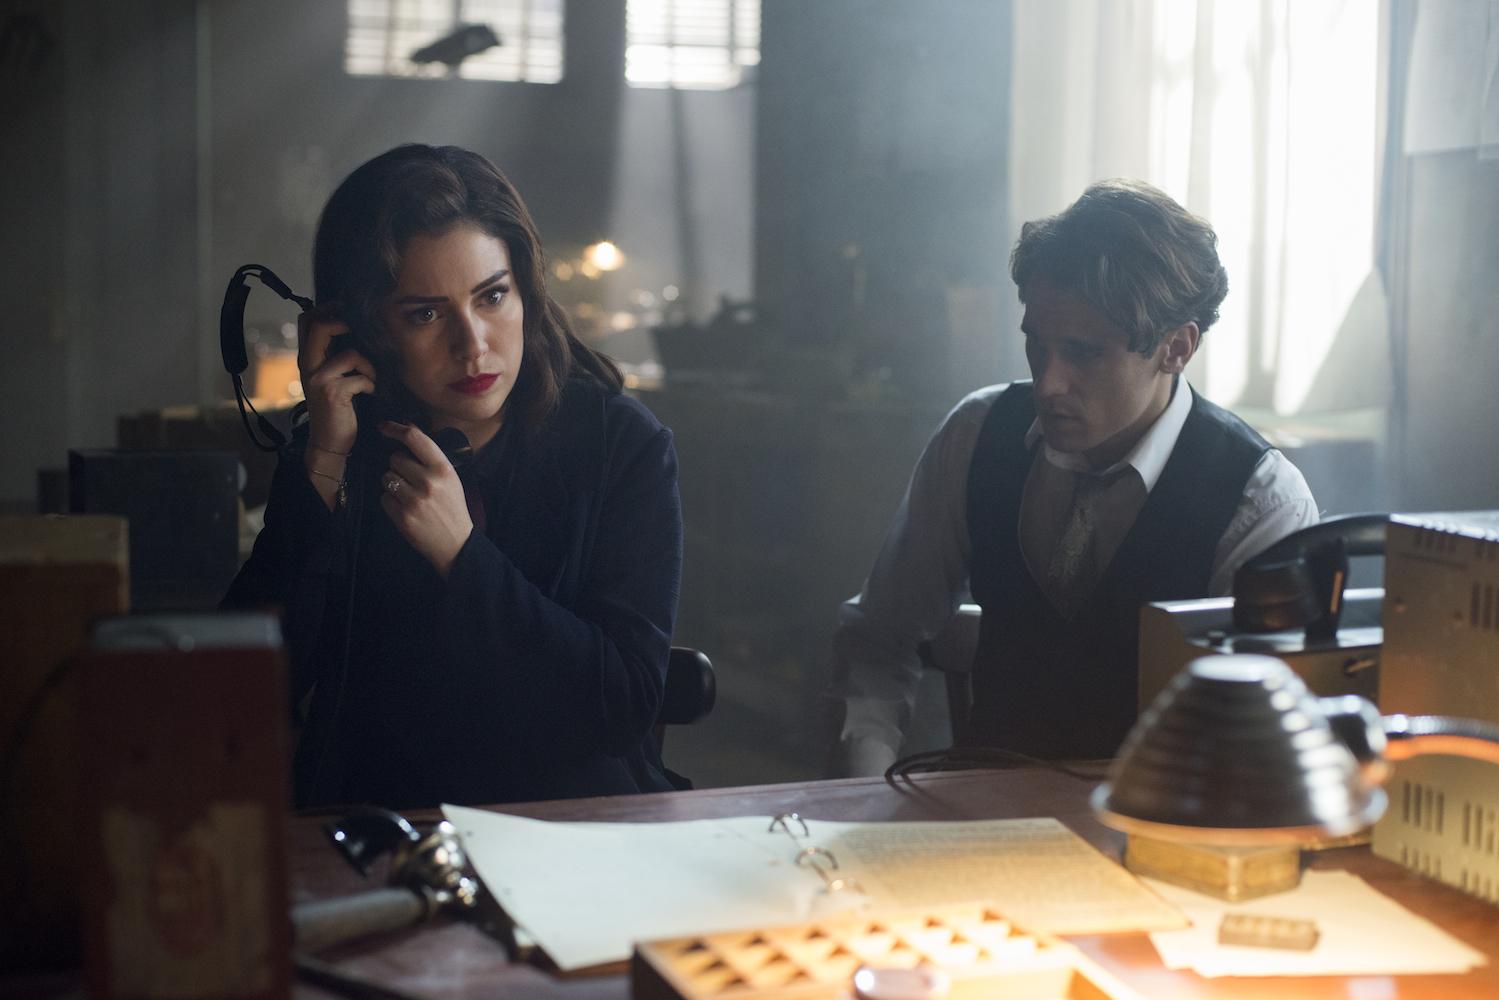 Trailer for Netflix 'Las Chicas del Cable' Season 3 Promises High Drama